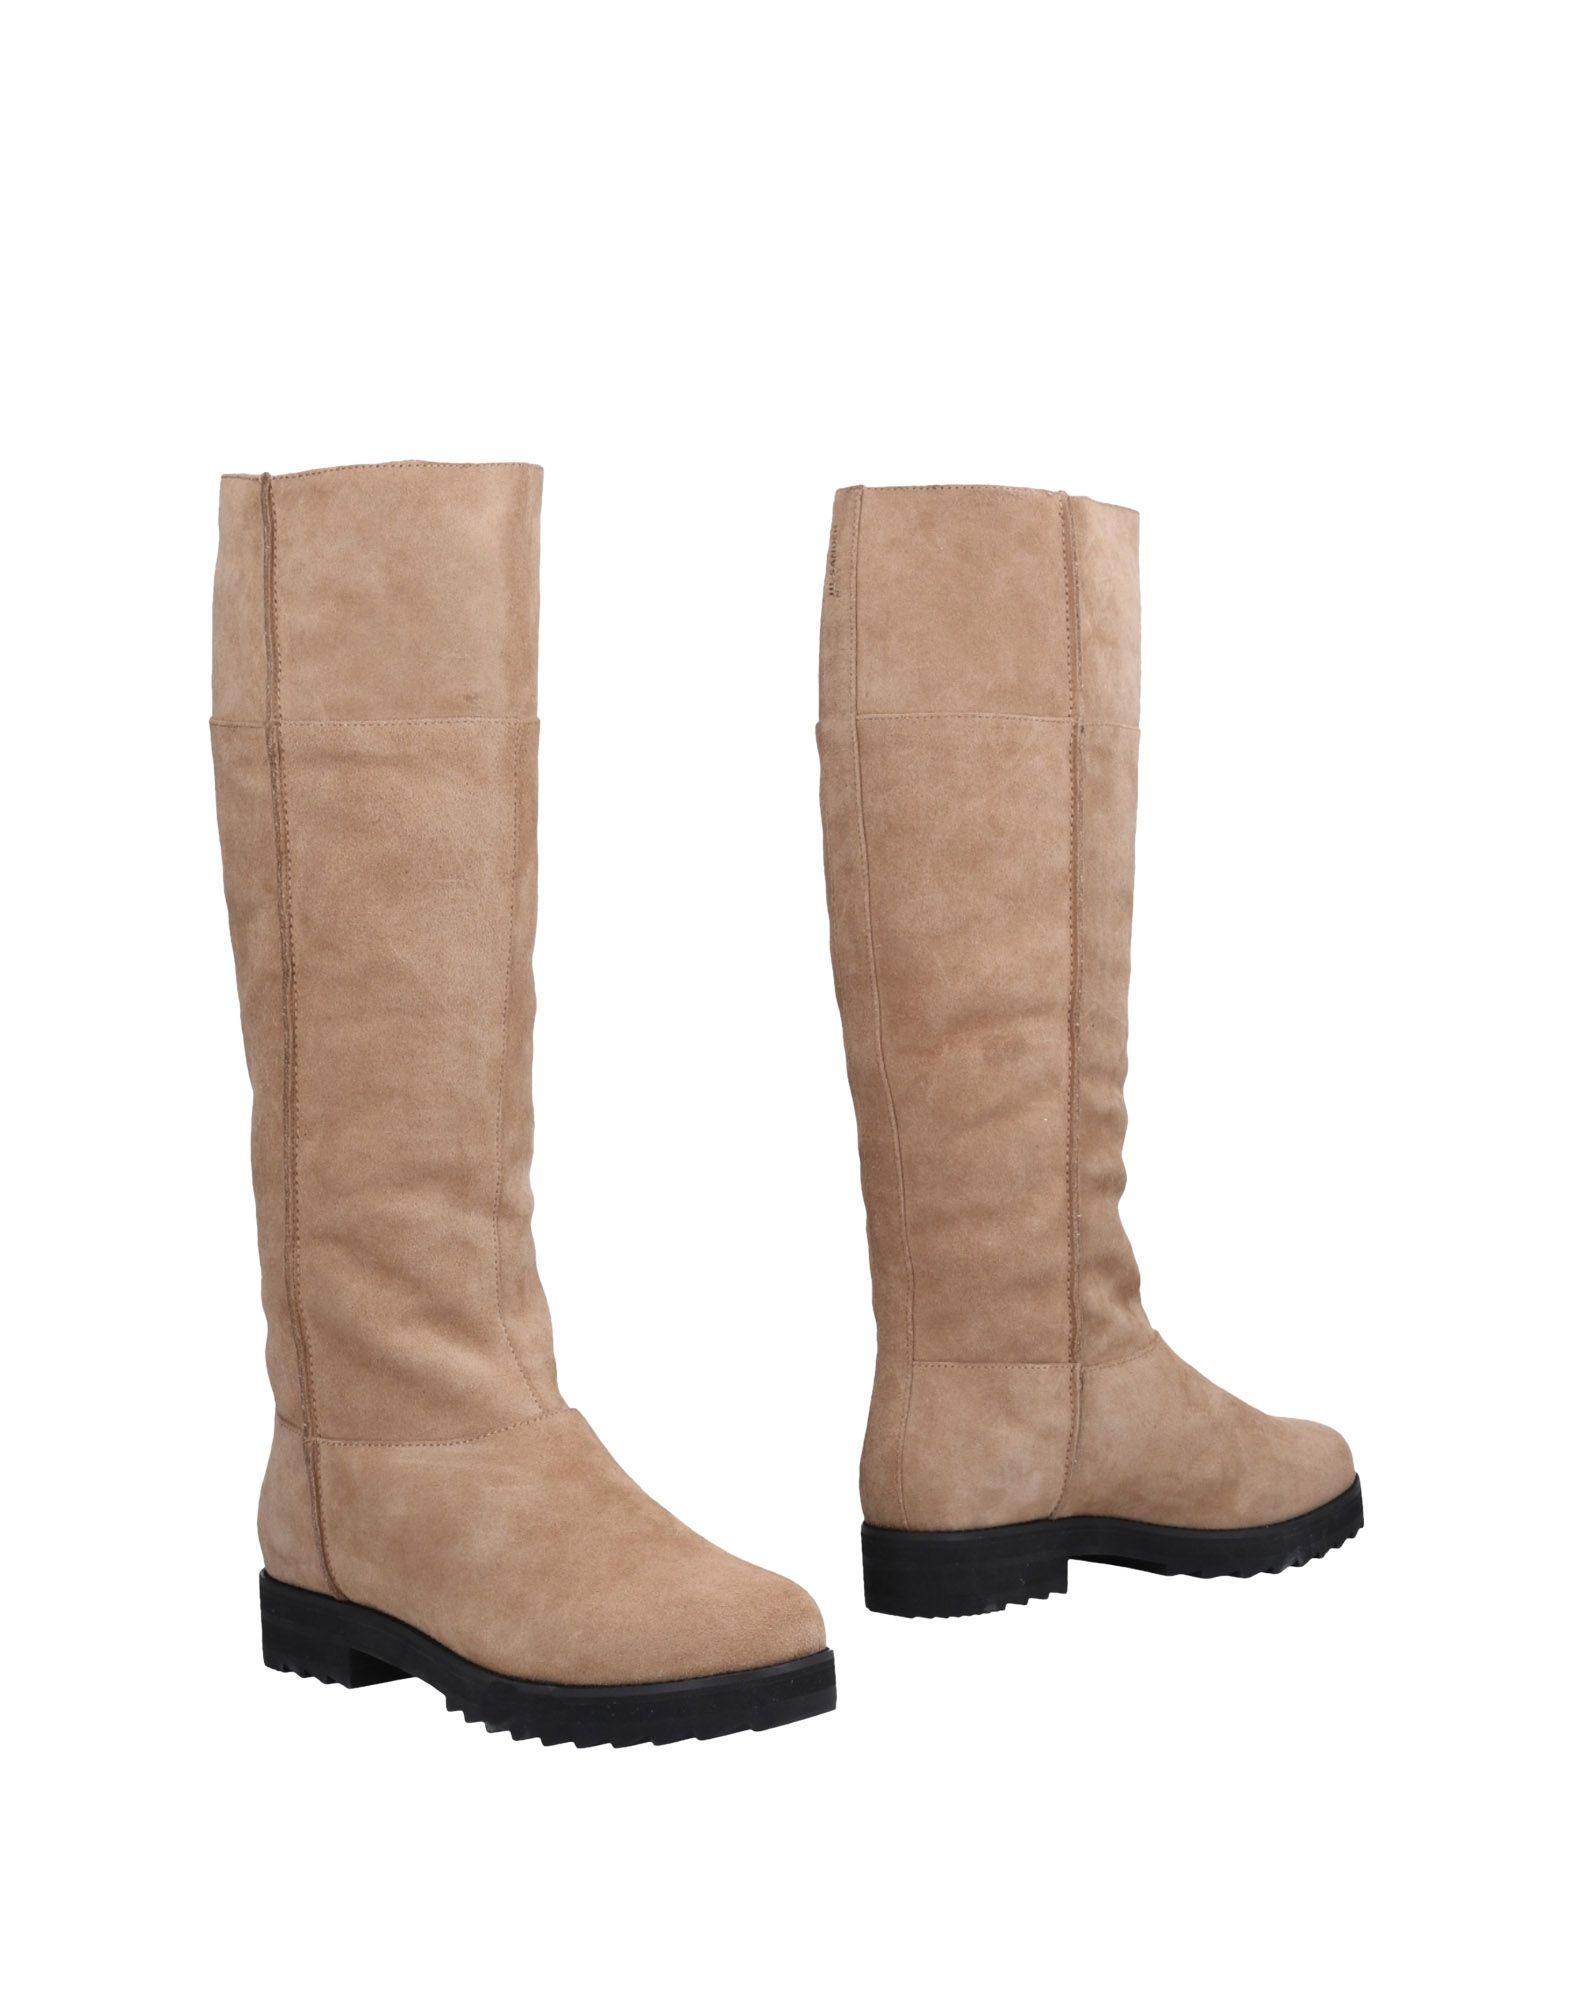 Jil Sander Navy Boots - - - Women Jil Sander Navy Boots online on  United Kingdom - 11490990EV 5130c9